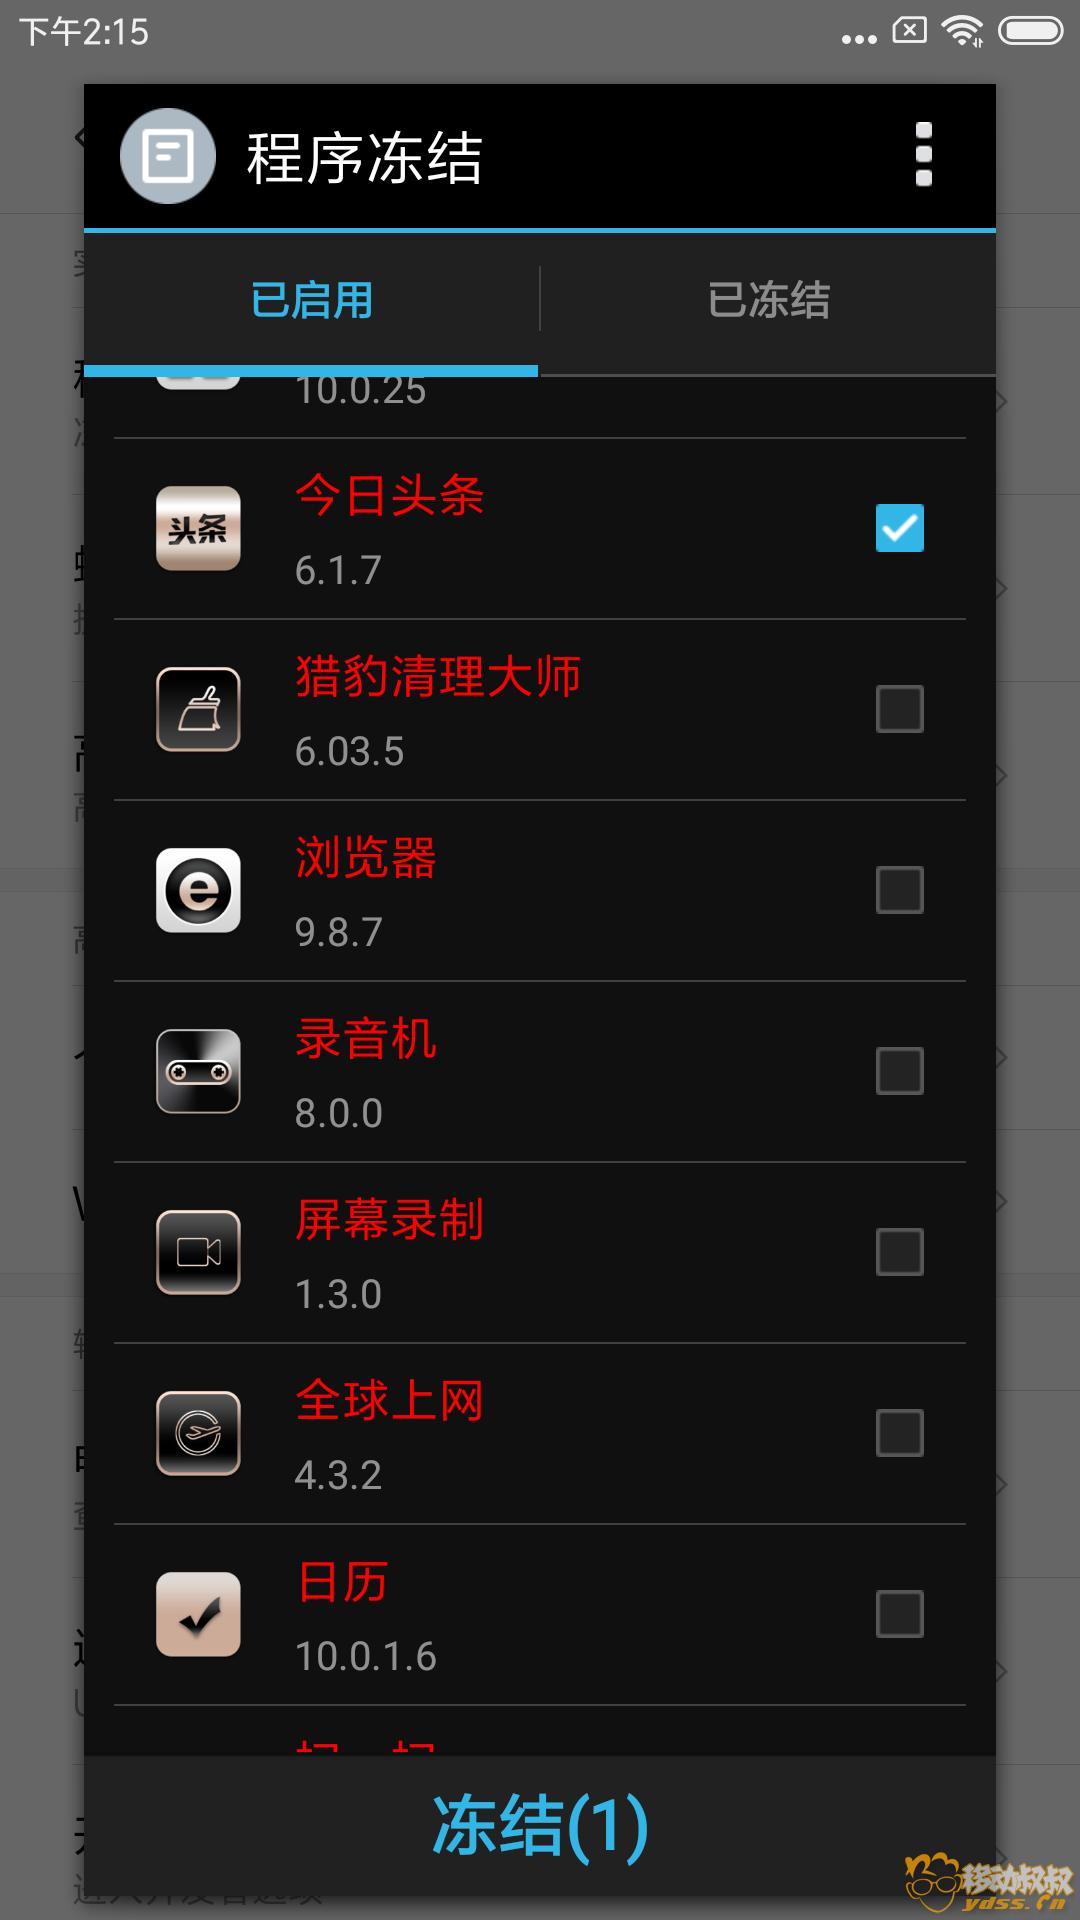 Screenshot_2018-11-07-14-15-48-253_com.smartapp.appfreezer.png